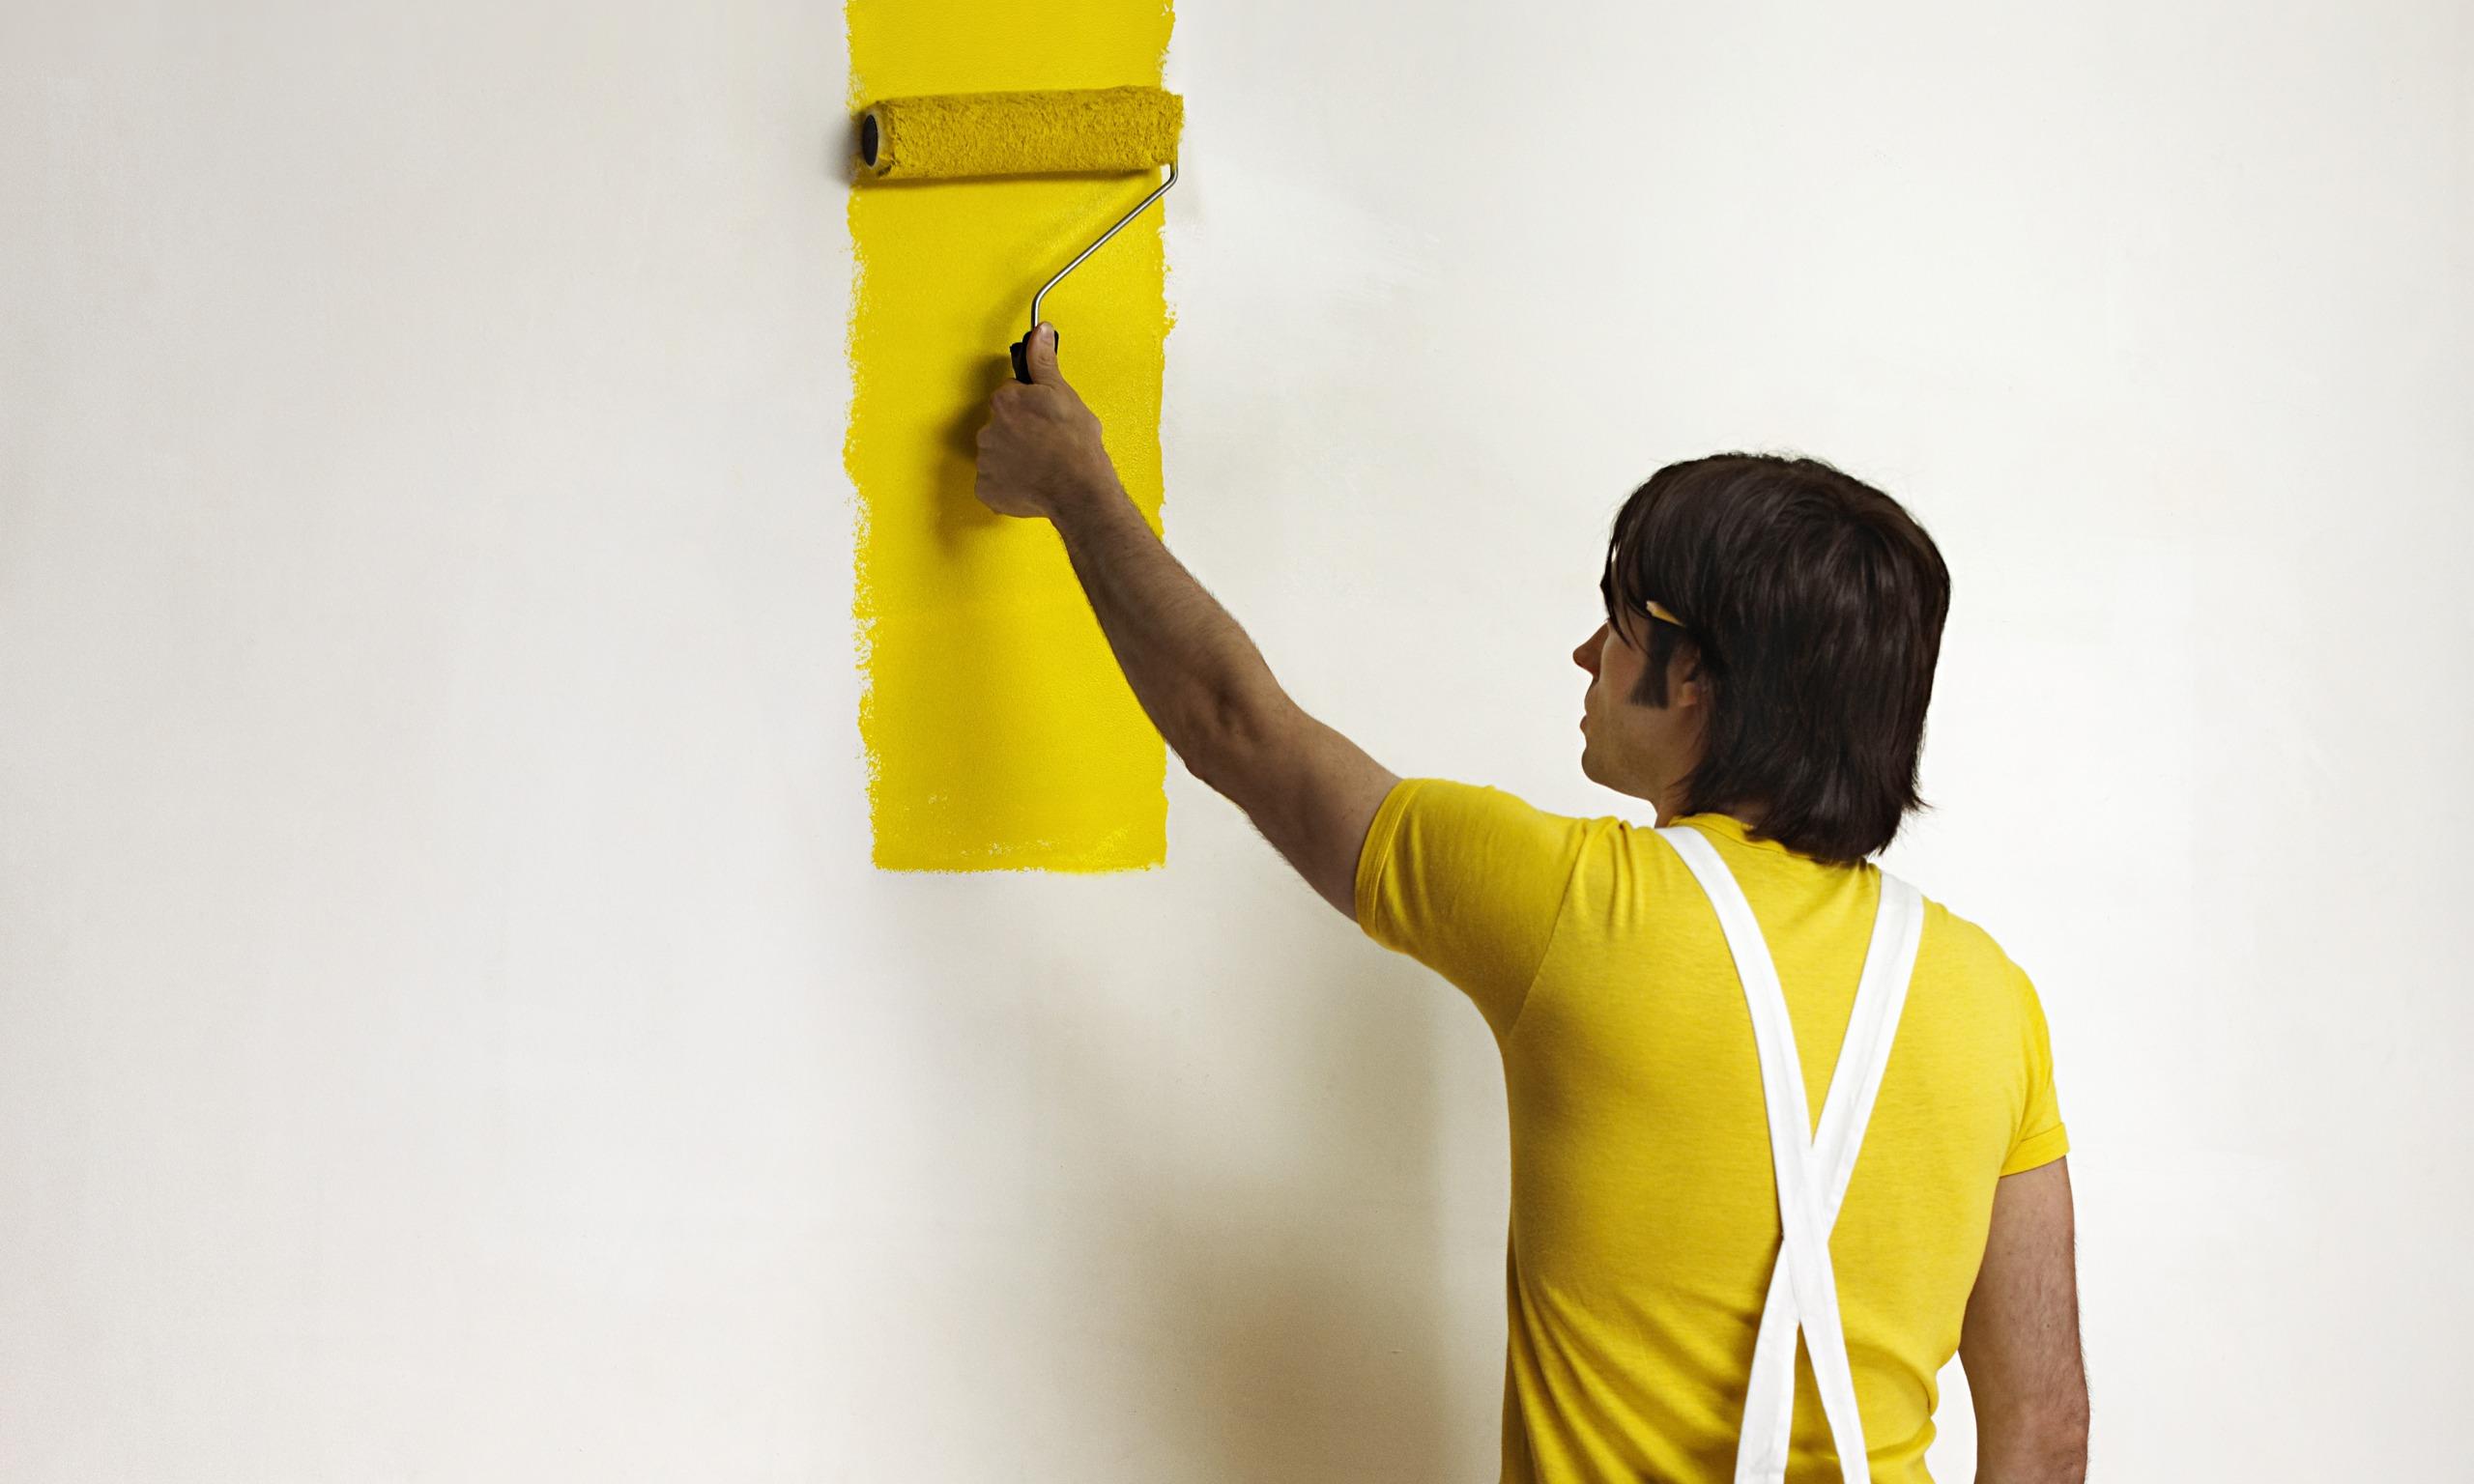 Painting services London | Handyman London | call :0800 8247013 ...